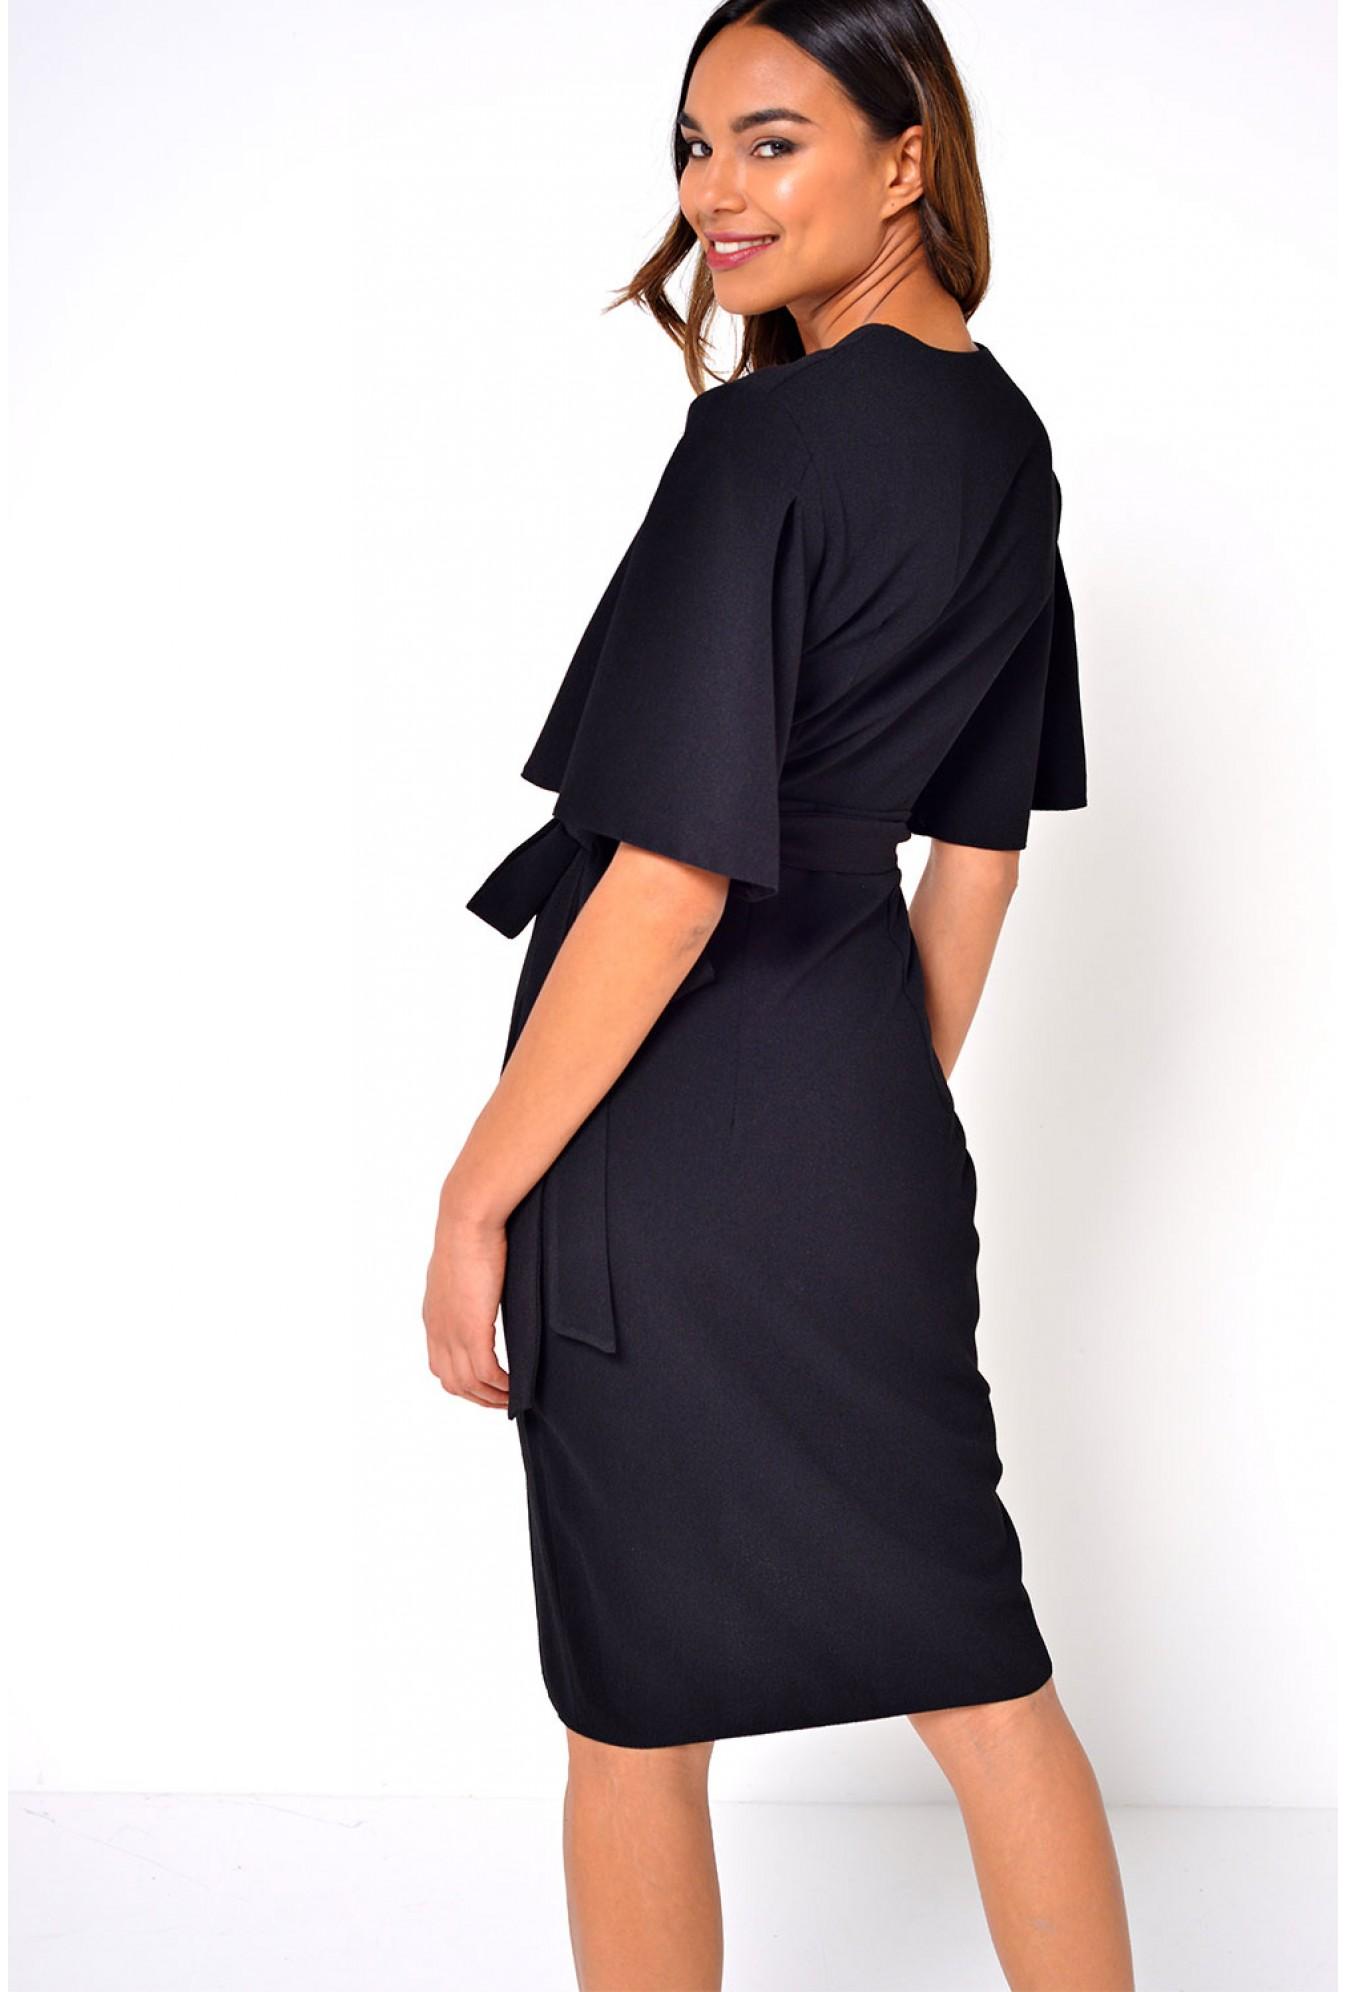 Ad Lib Dress | Ivory One Shoulder Chiffon Dress For